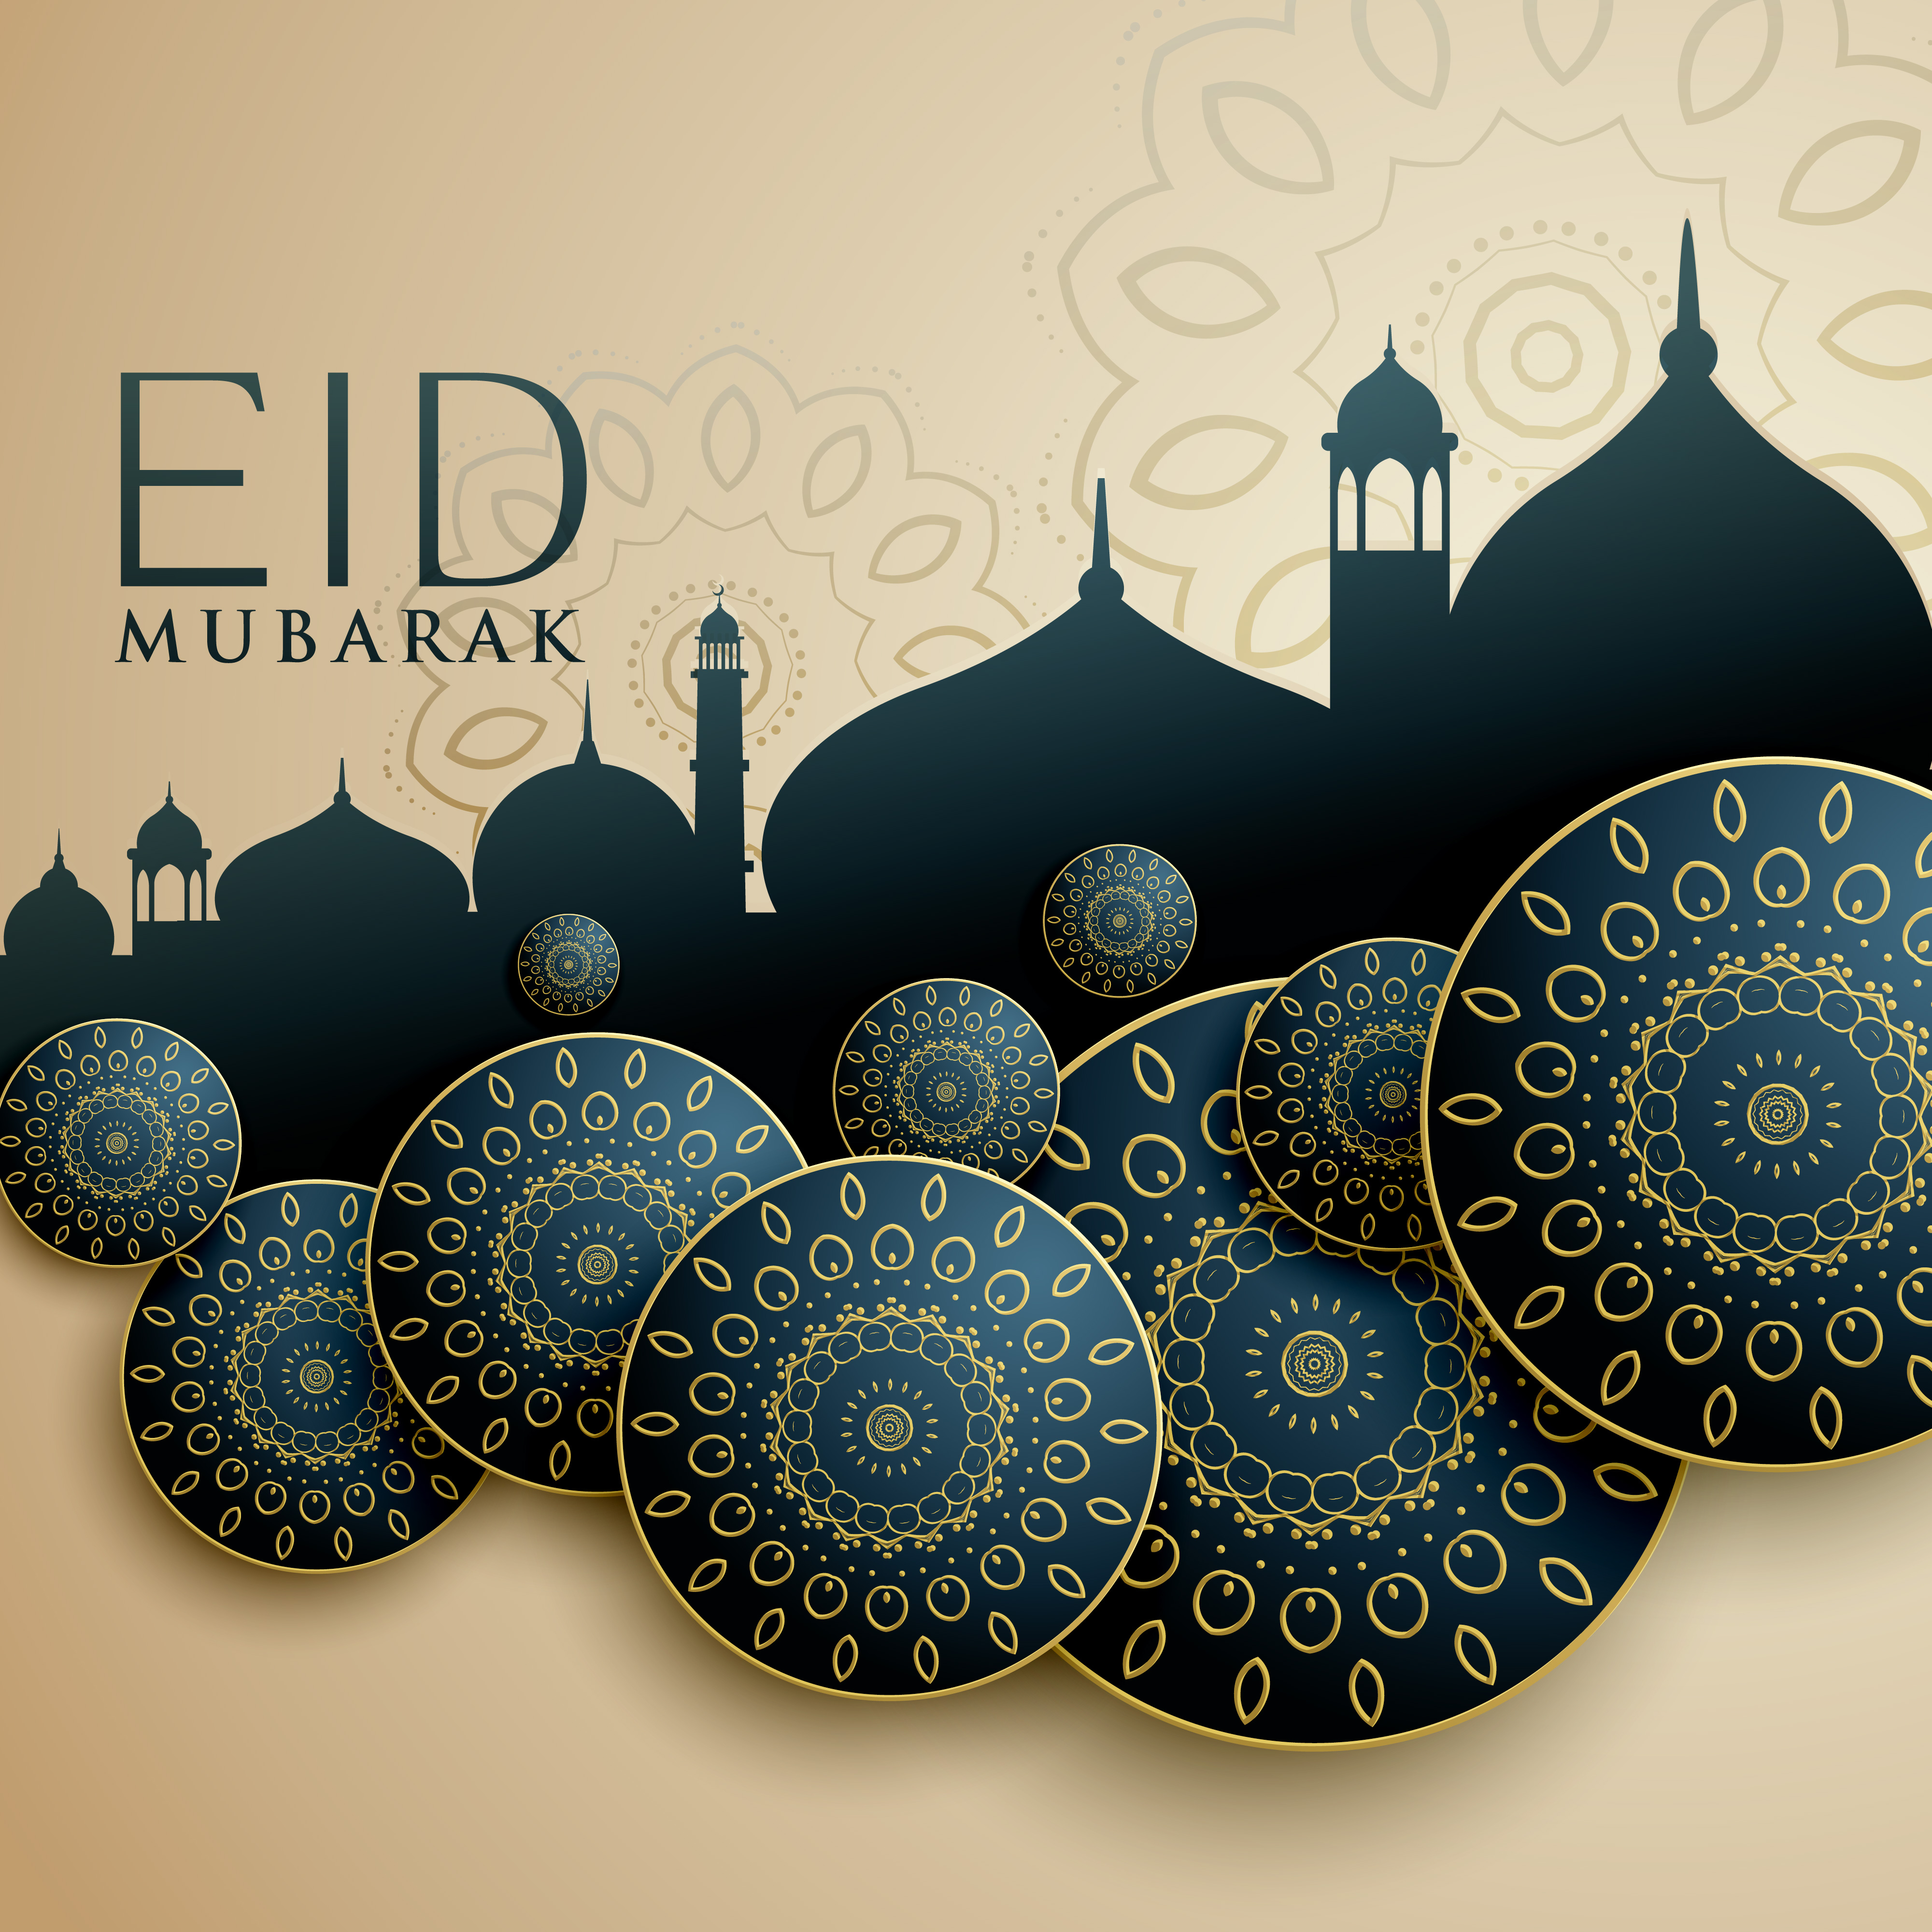 Islamic design for eid mubarak festival - Download Free